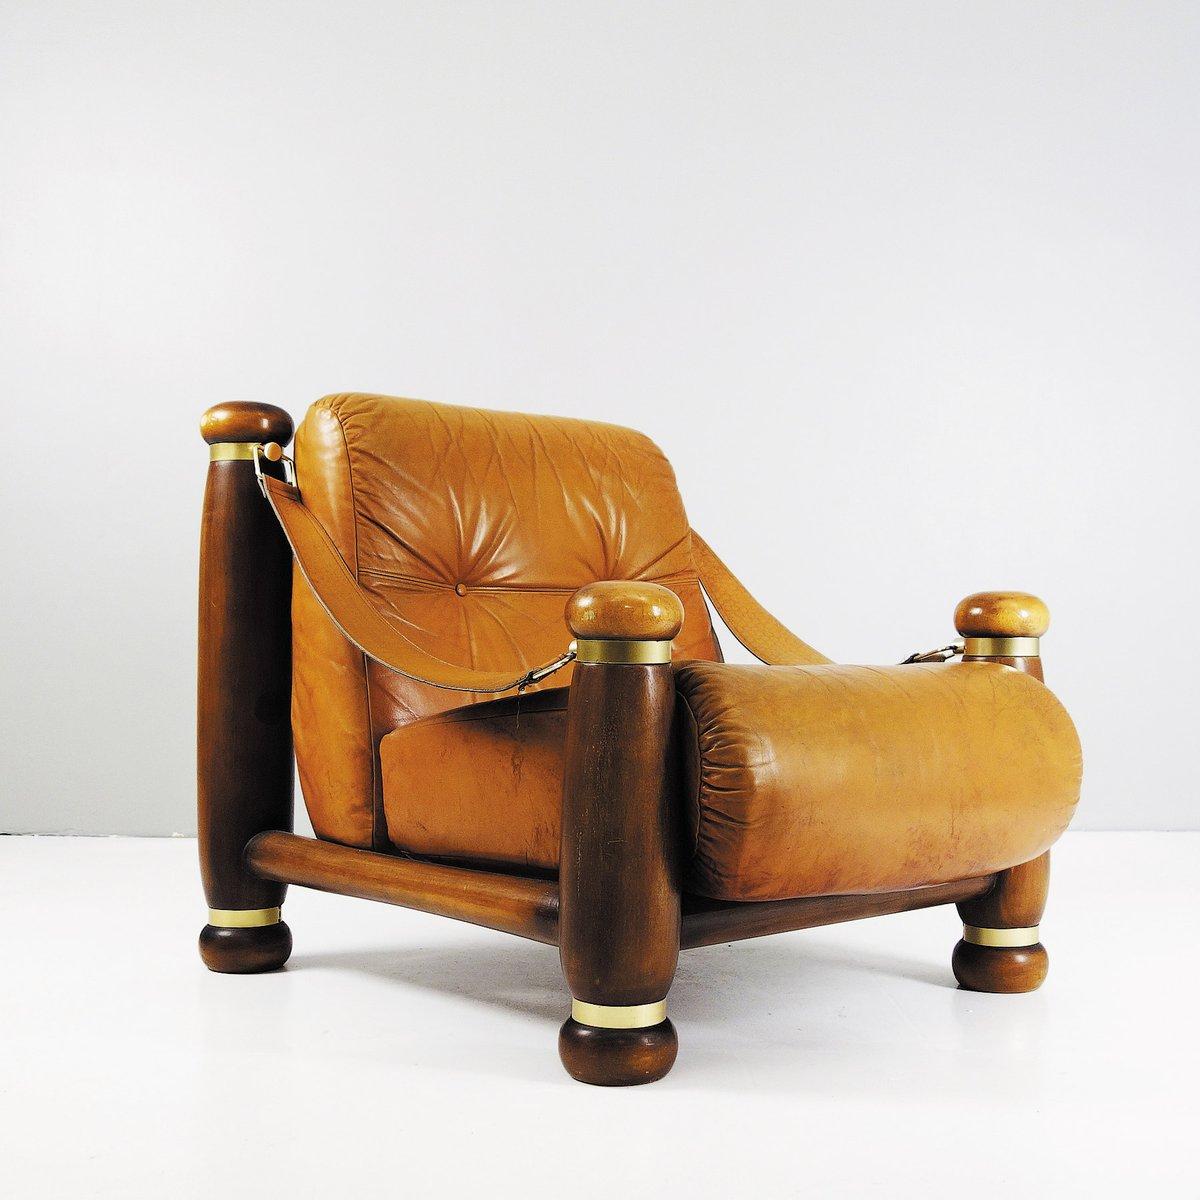 Großer Sessel aus Leder, 1970er